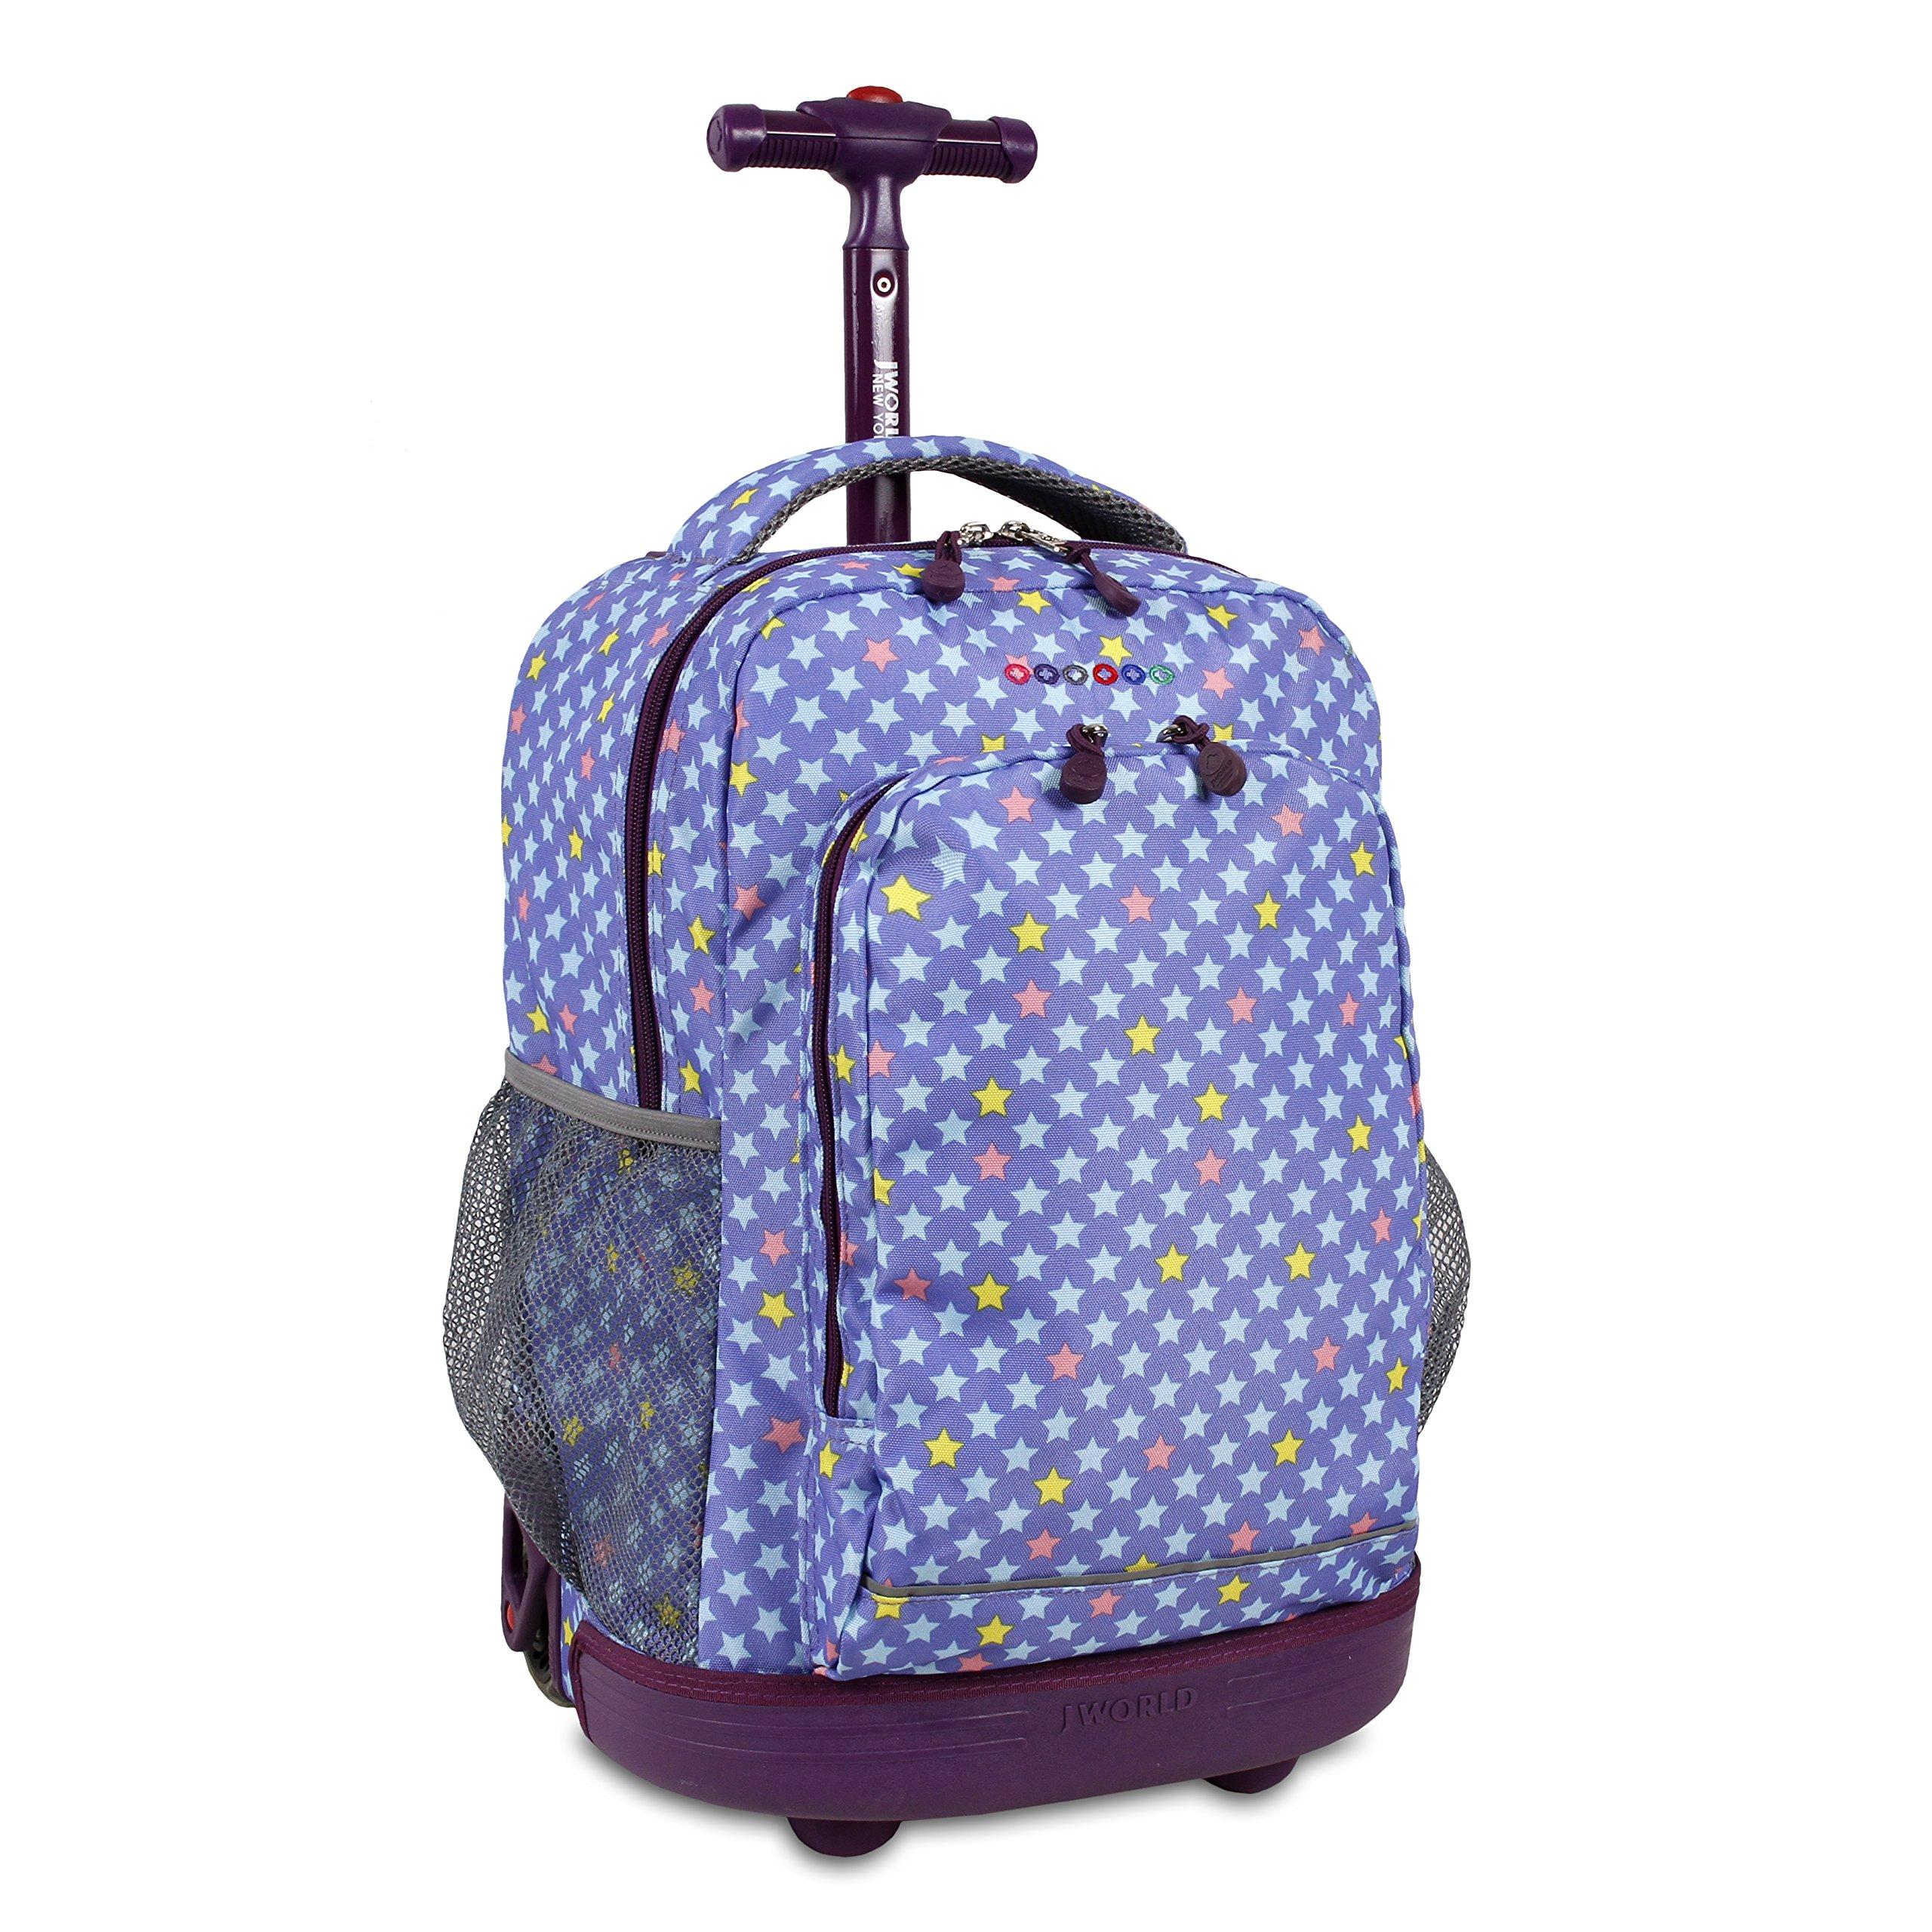 J World New York Girls' Sunrise Rolling Fashion Backpack, Stardust, One Size